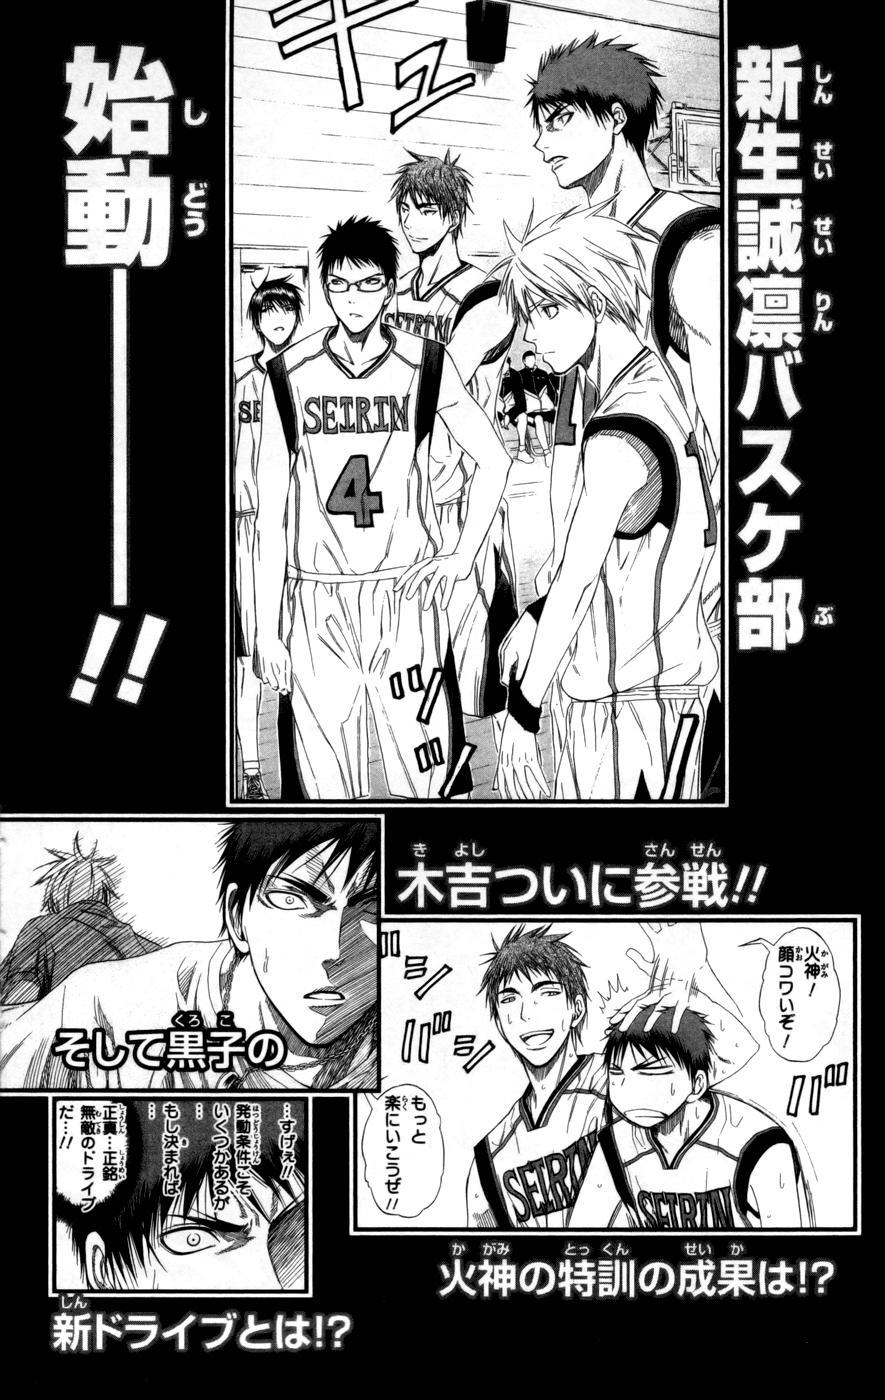 Kuroko No Basket chap 080 trang 20